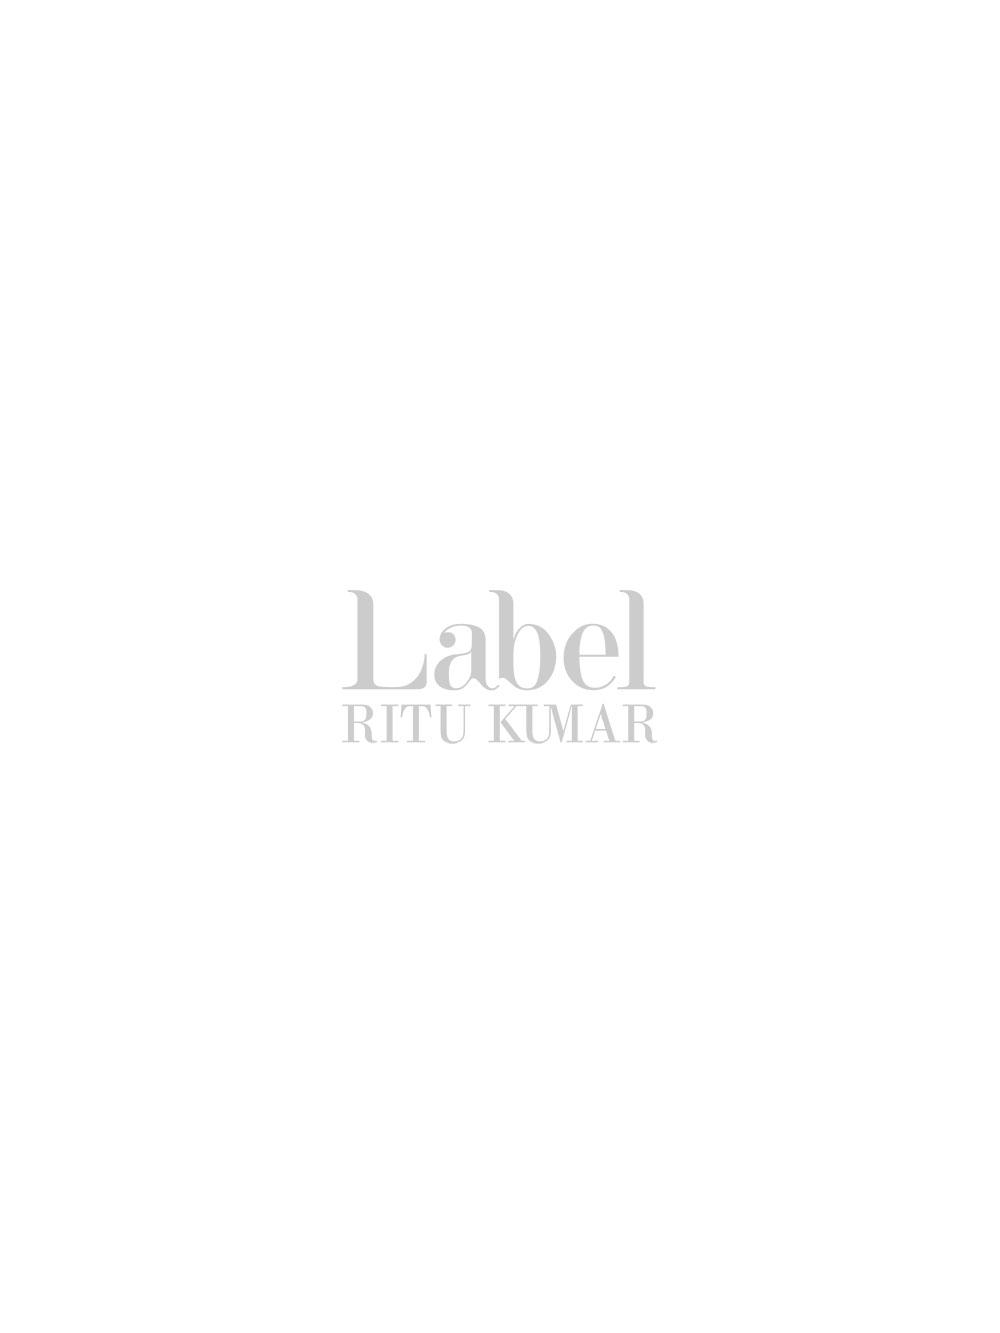 Navy Curve Fit Pants By Label Ritu Kumar